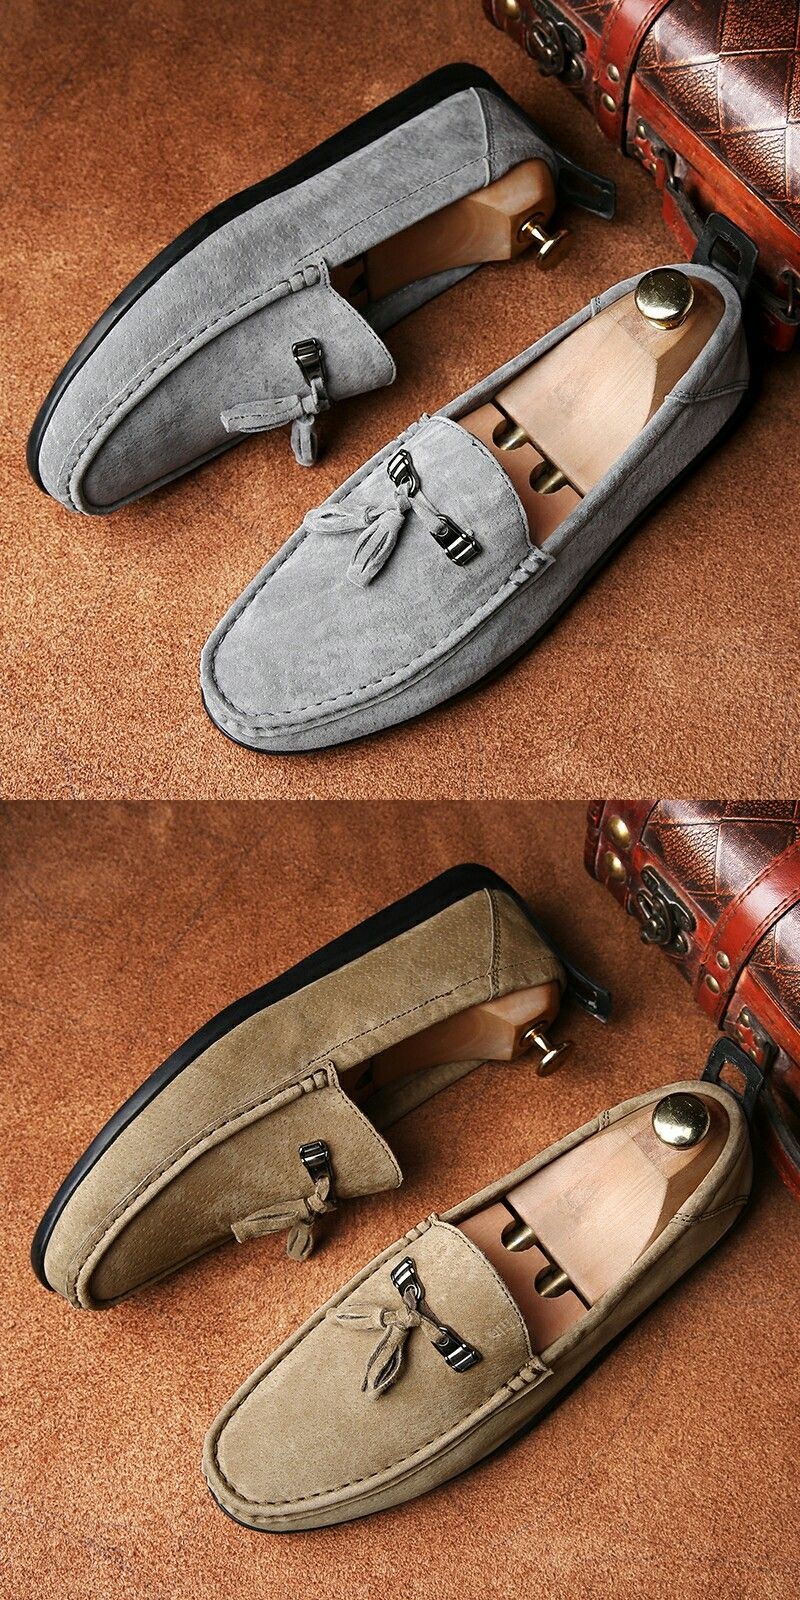 d72350d1309 US  26.7  Click to buy  Prelesty Vintage Delicate Italian Light Men Penny  Loafer Classic Elegant Formal Dress Shoe